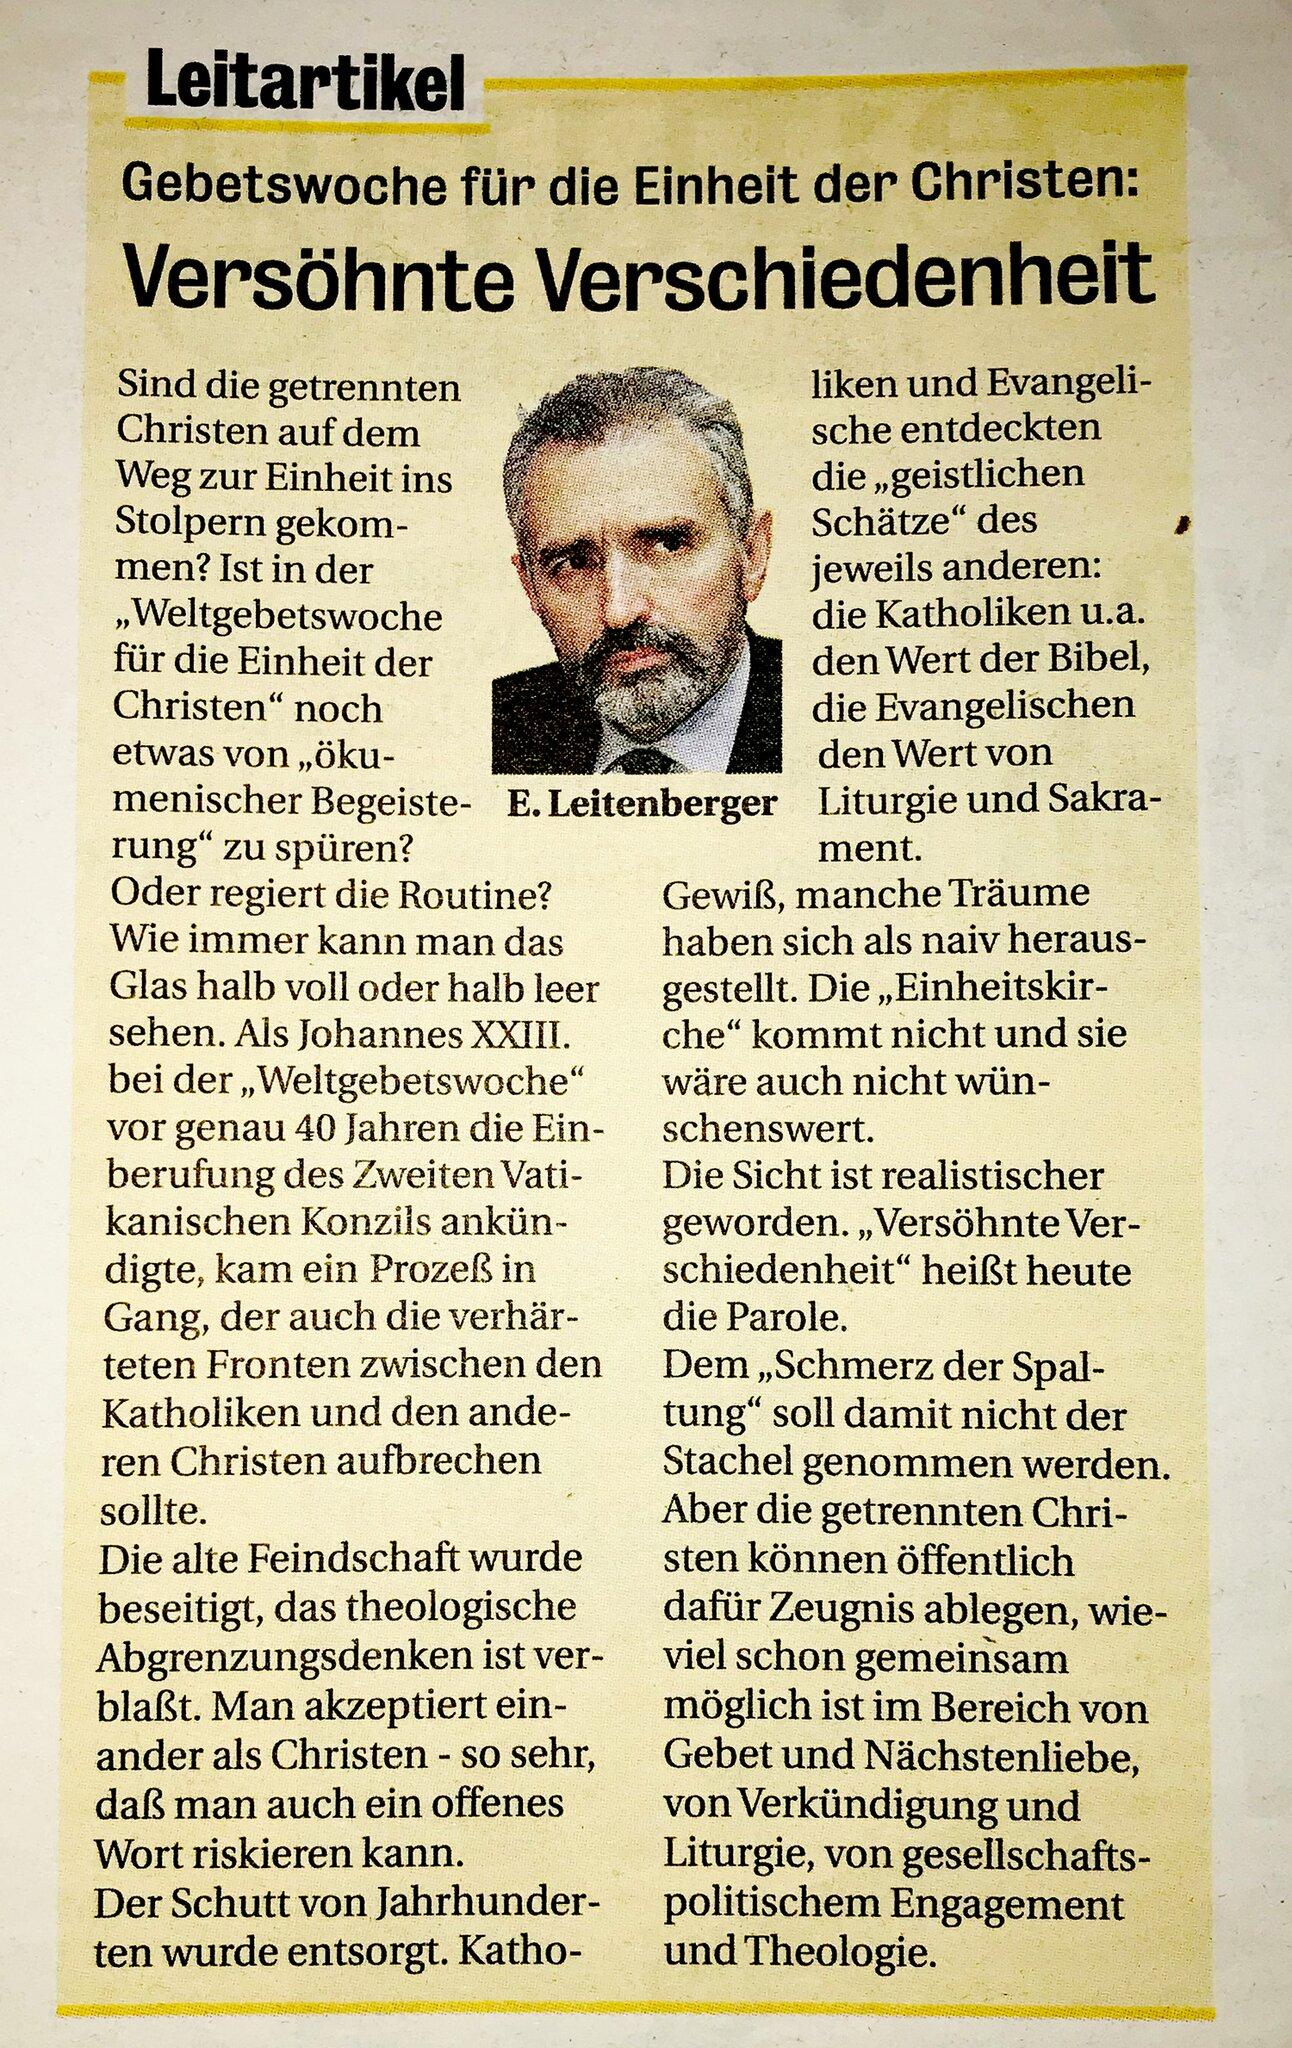 Leitartikel vom 17. Jänner 1999 © Wiener Dom-Verlag